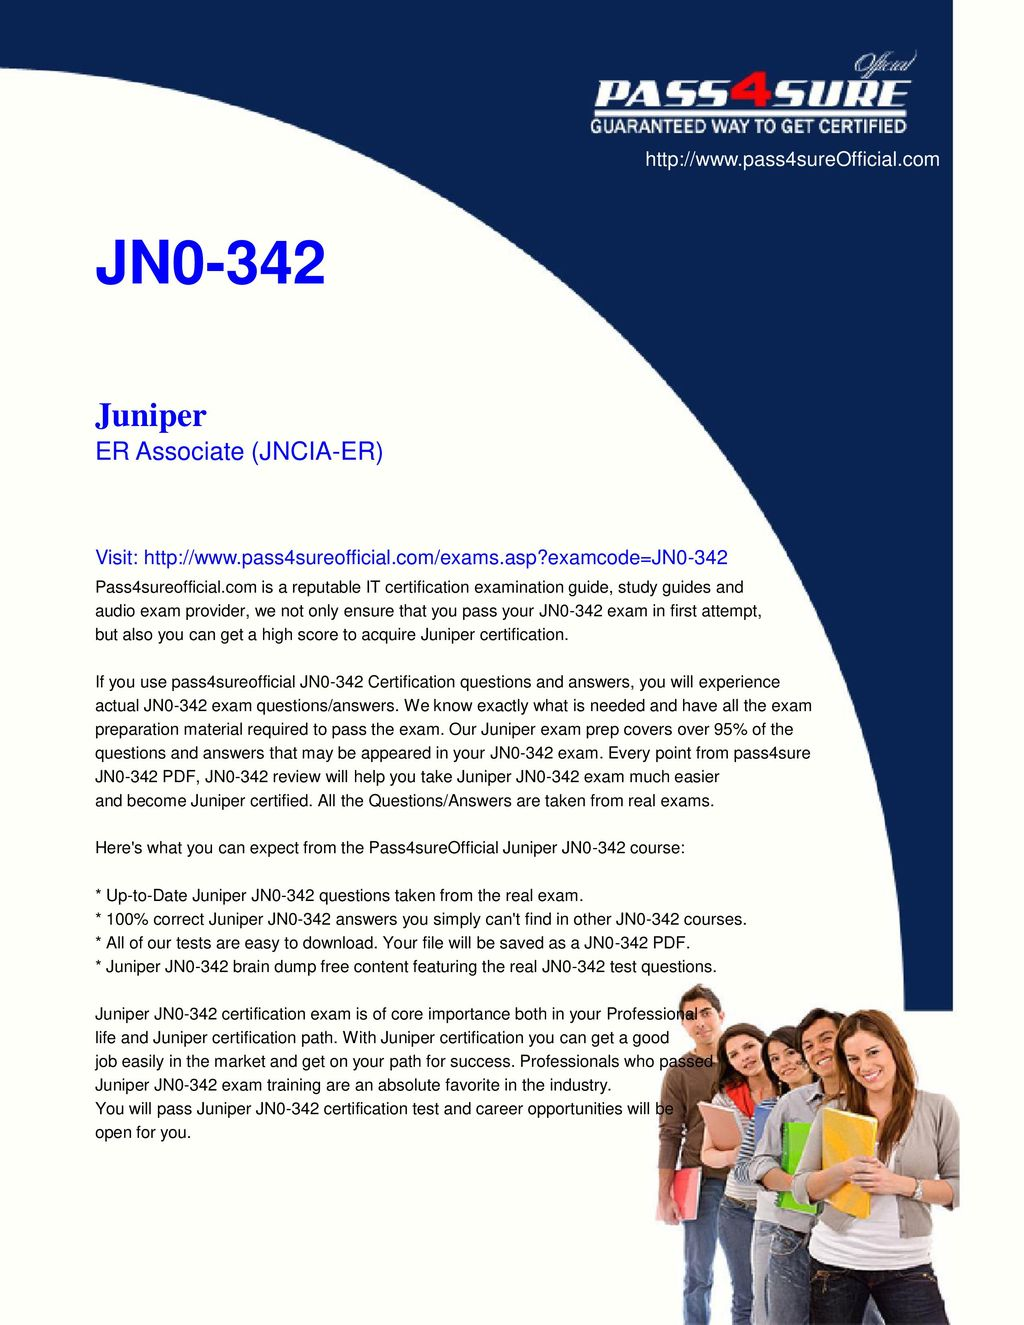 JN0-342 Juniper ER Associate (JNCIA-ER) - ppt download